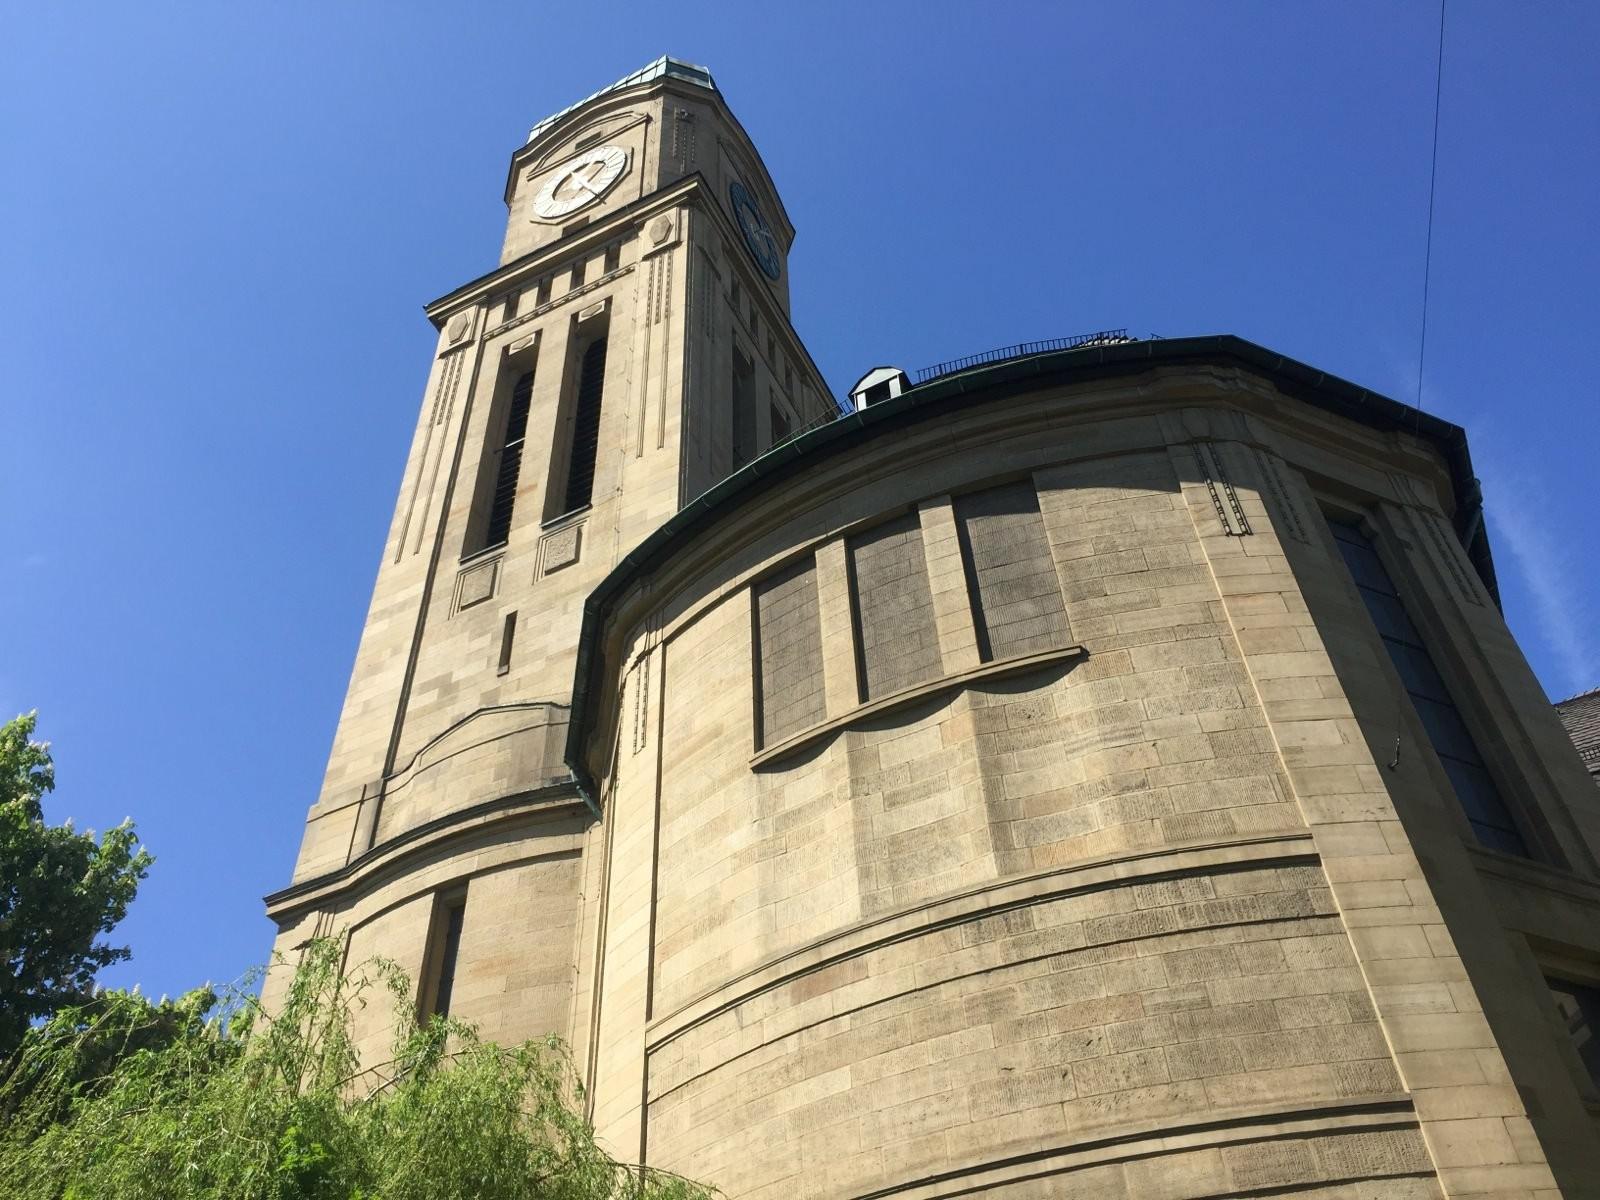 100 Jahre St. Bonifatius Kirche | Foto: Neckarstadtblog